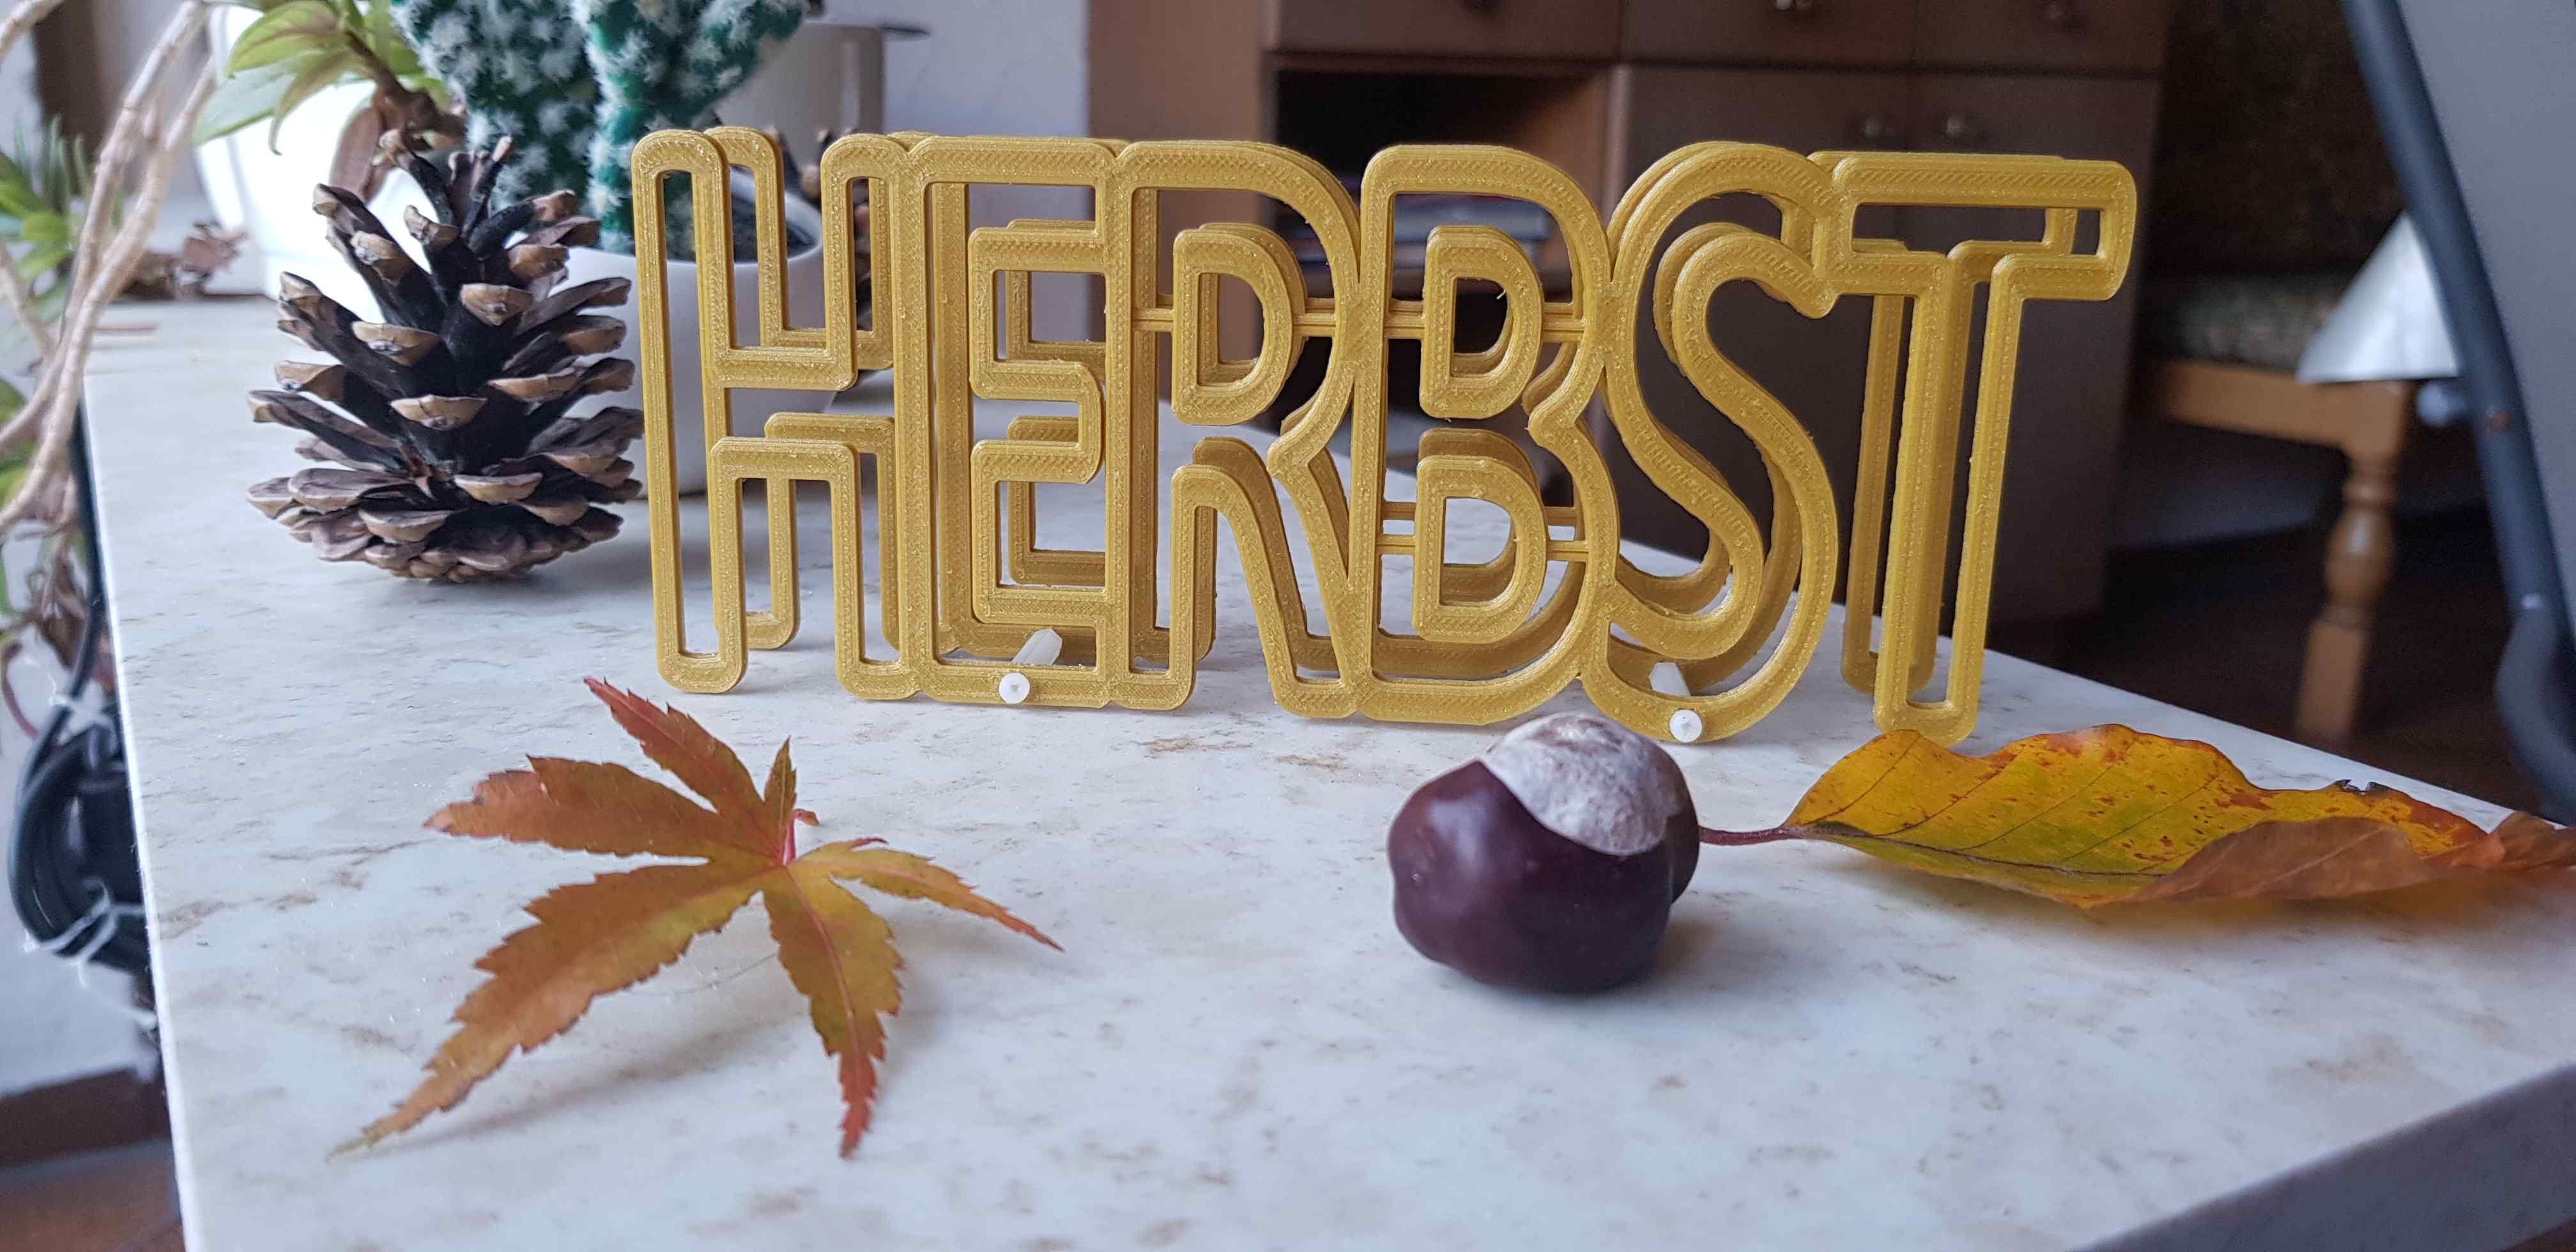 HERBST 3D-Tischdeko #tischdekoherbstesstisch